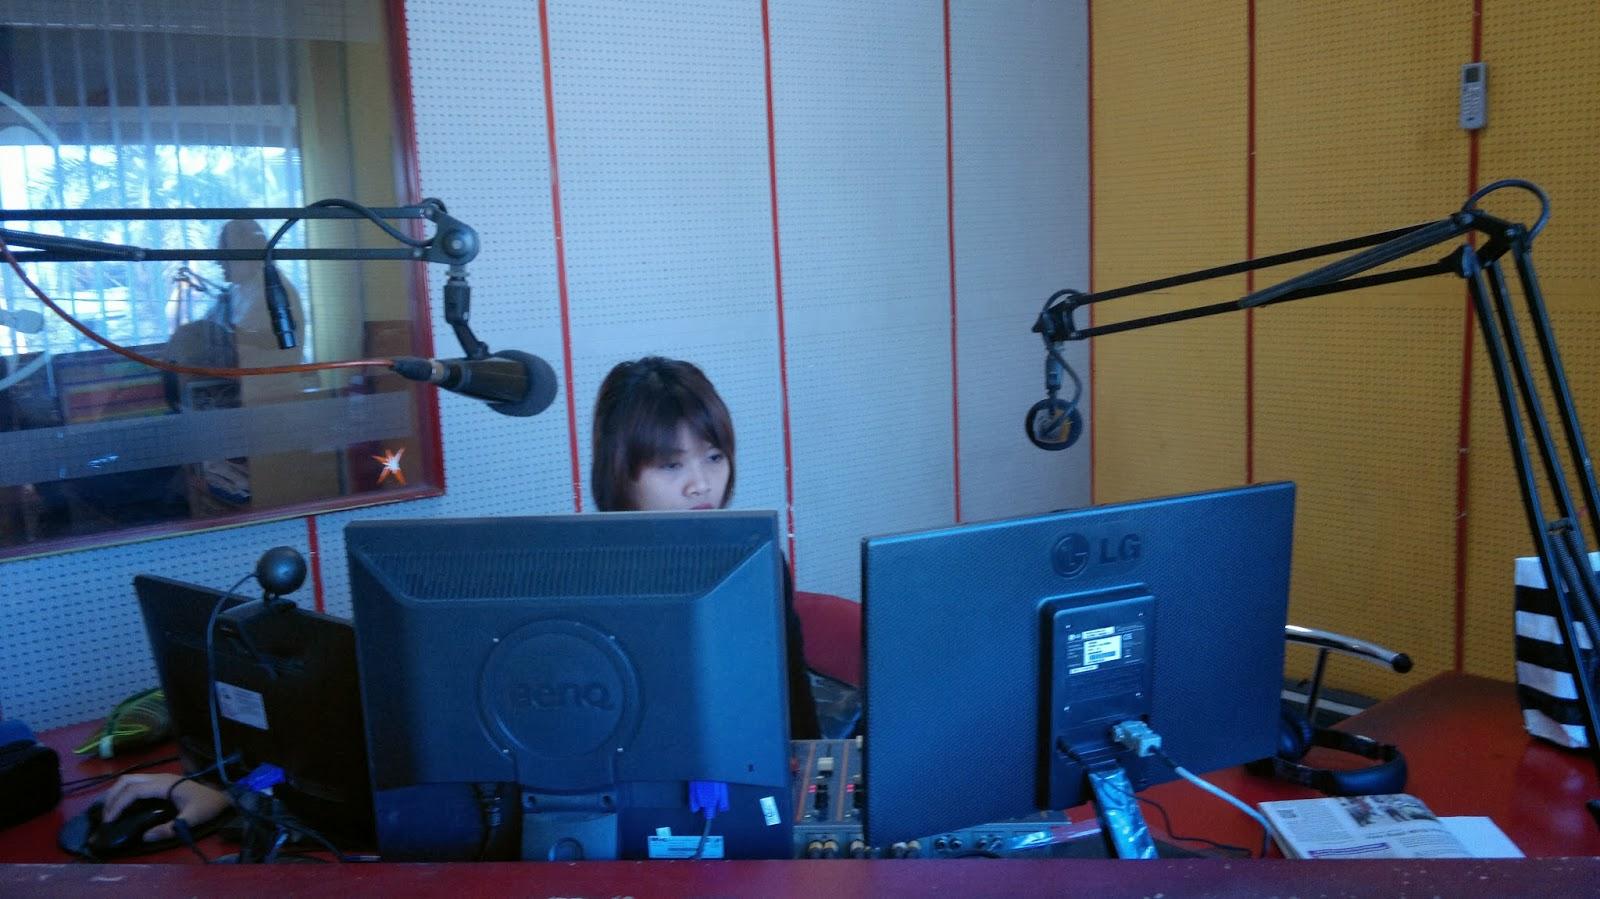 Radio Branding Materials Studio Office Interior Prambors Radio